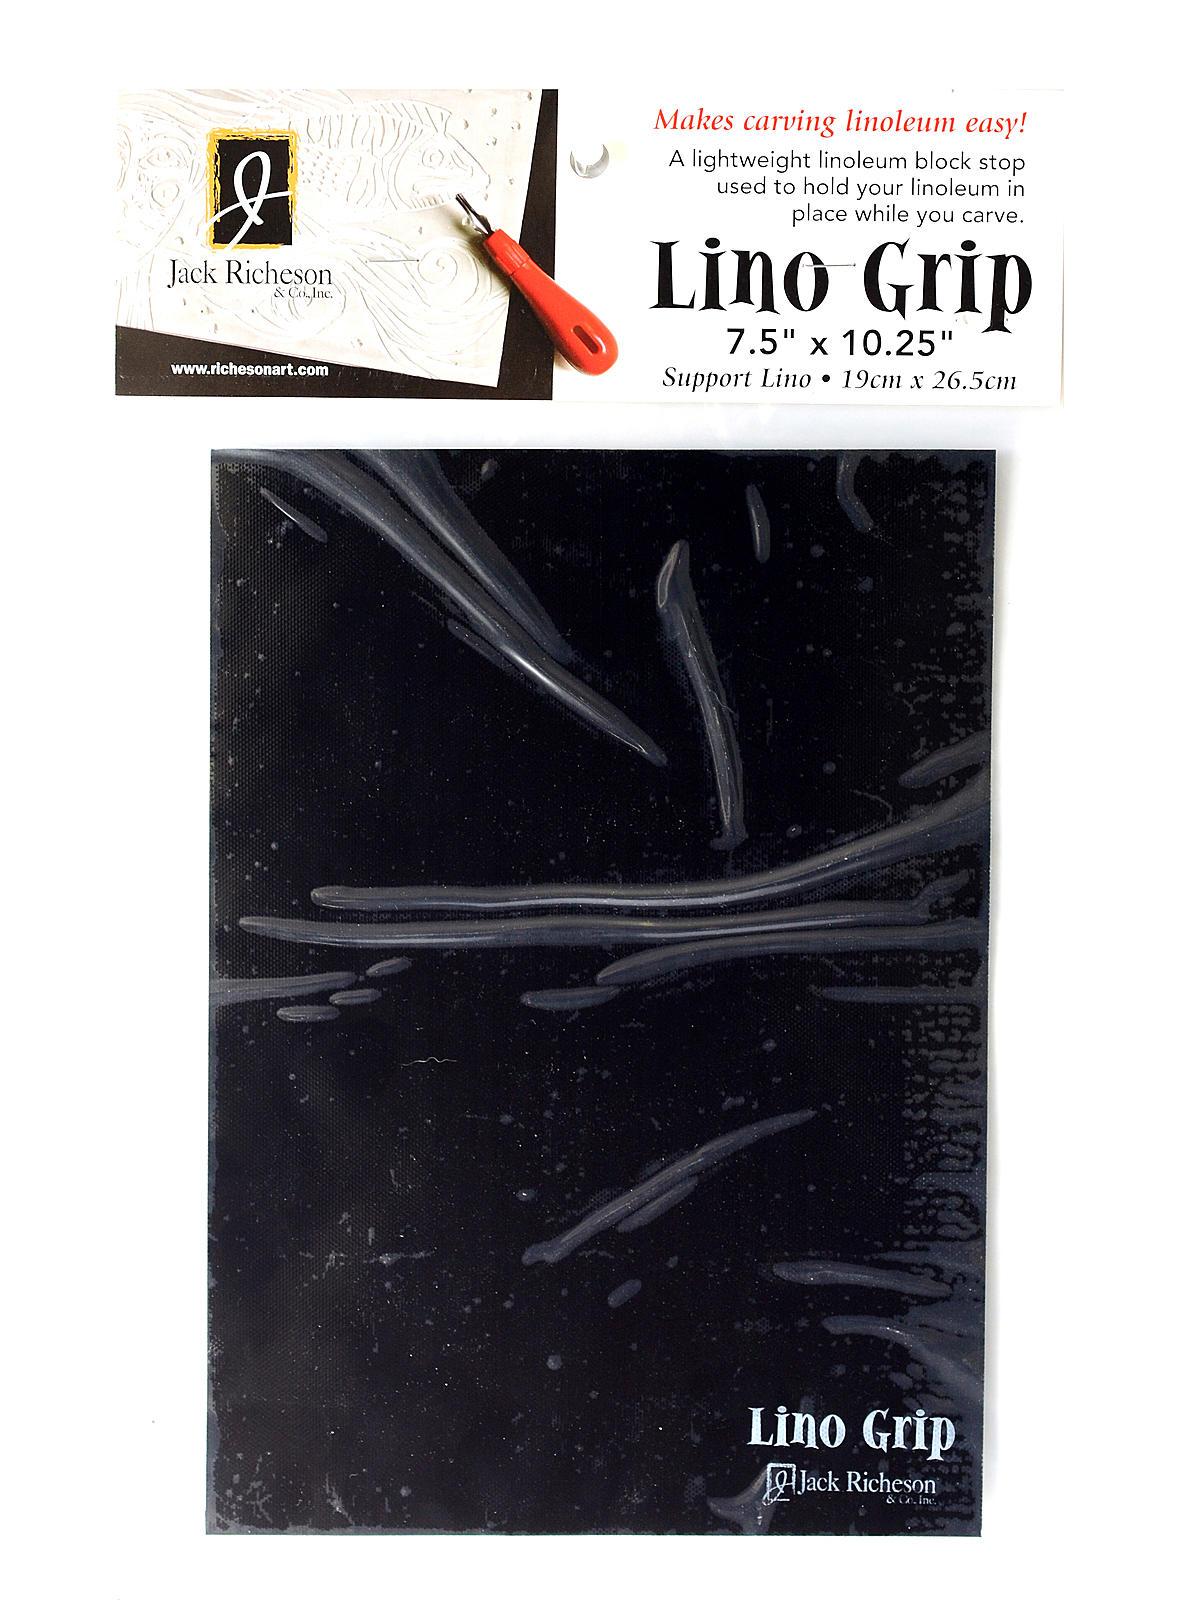 Lino Grip